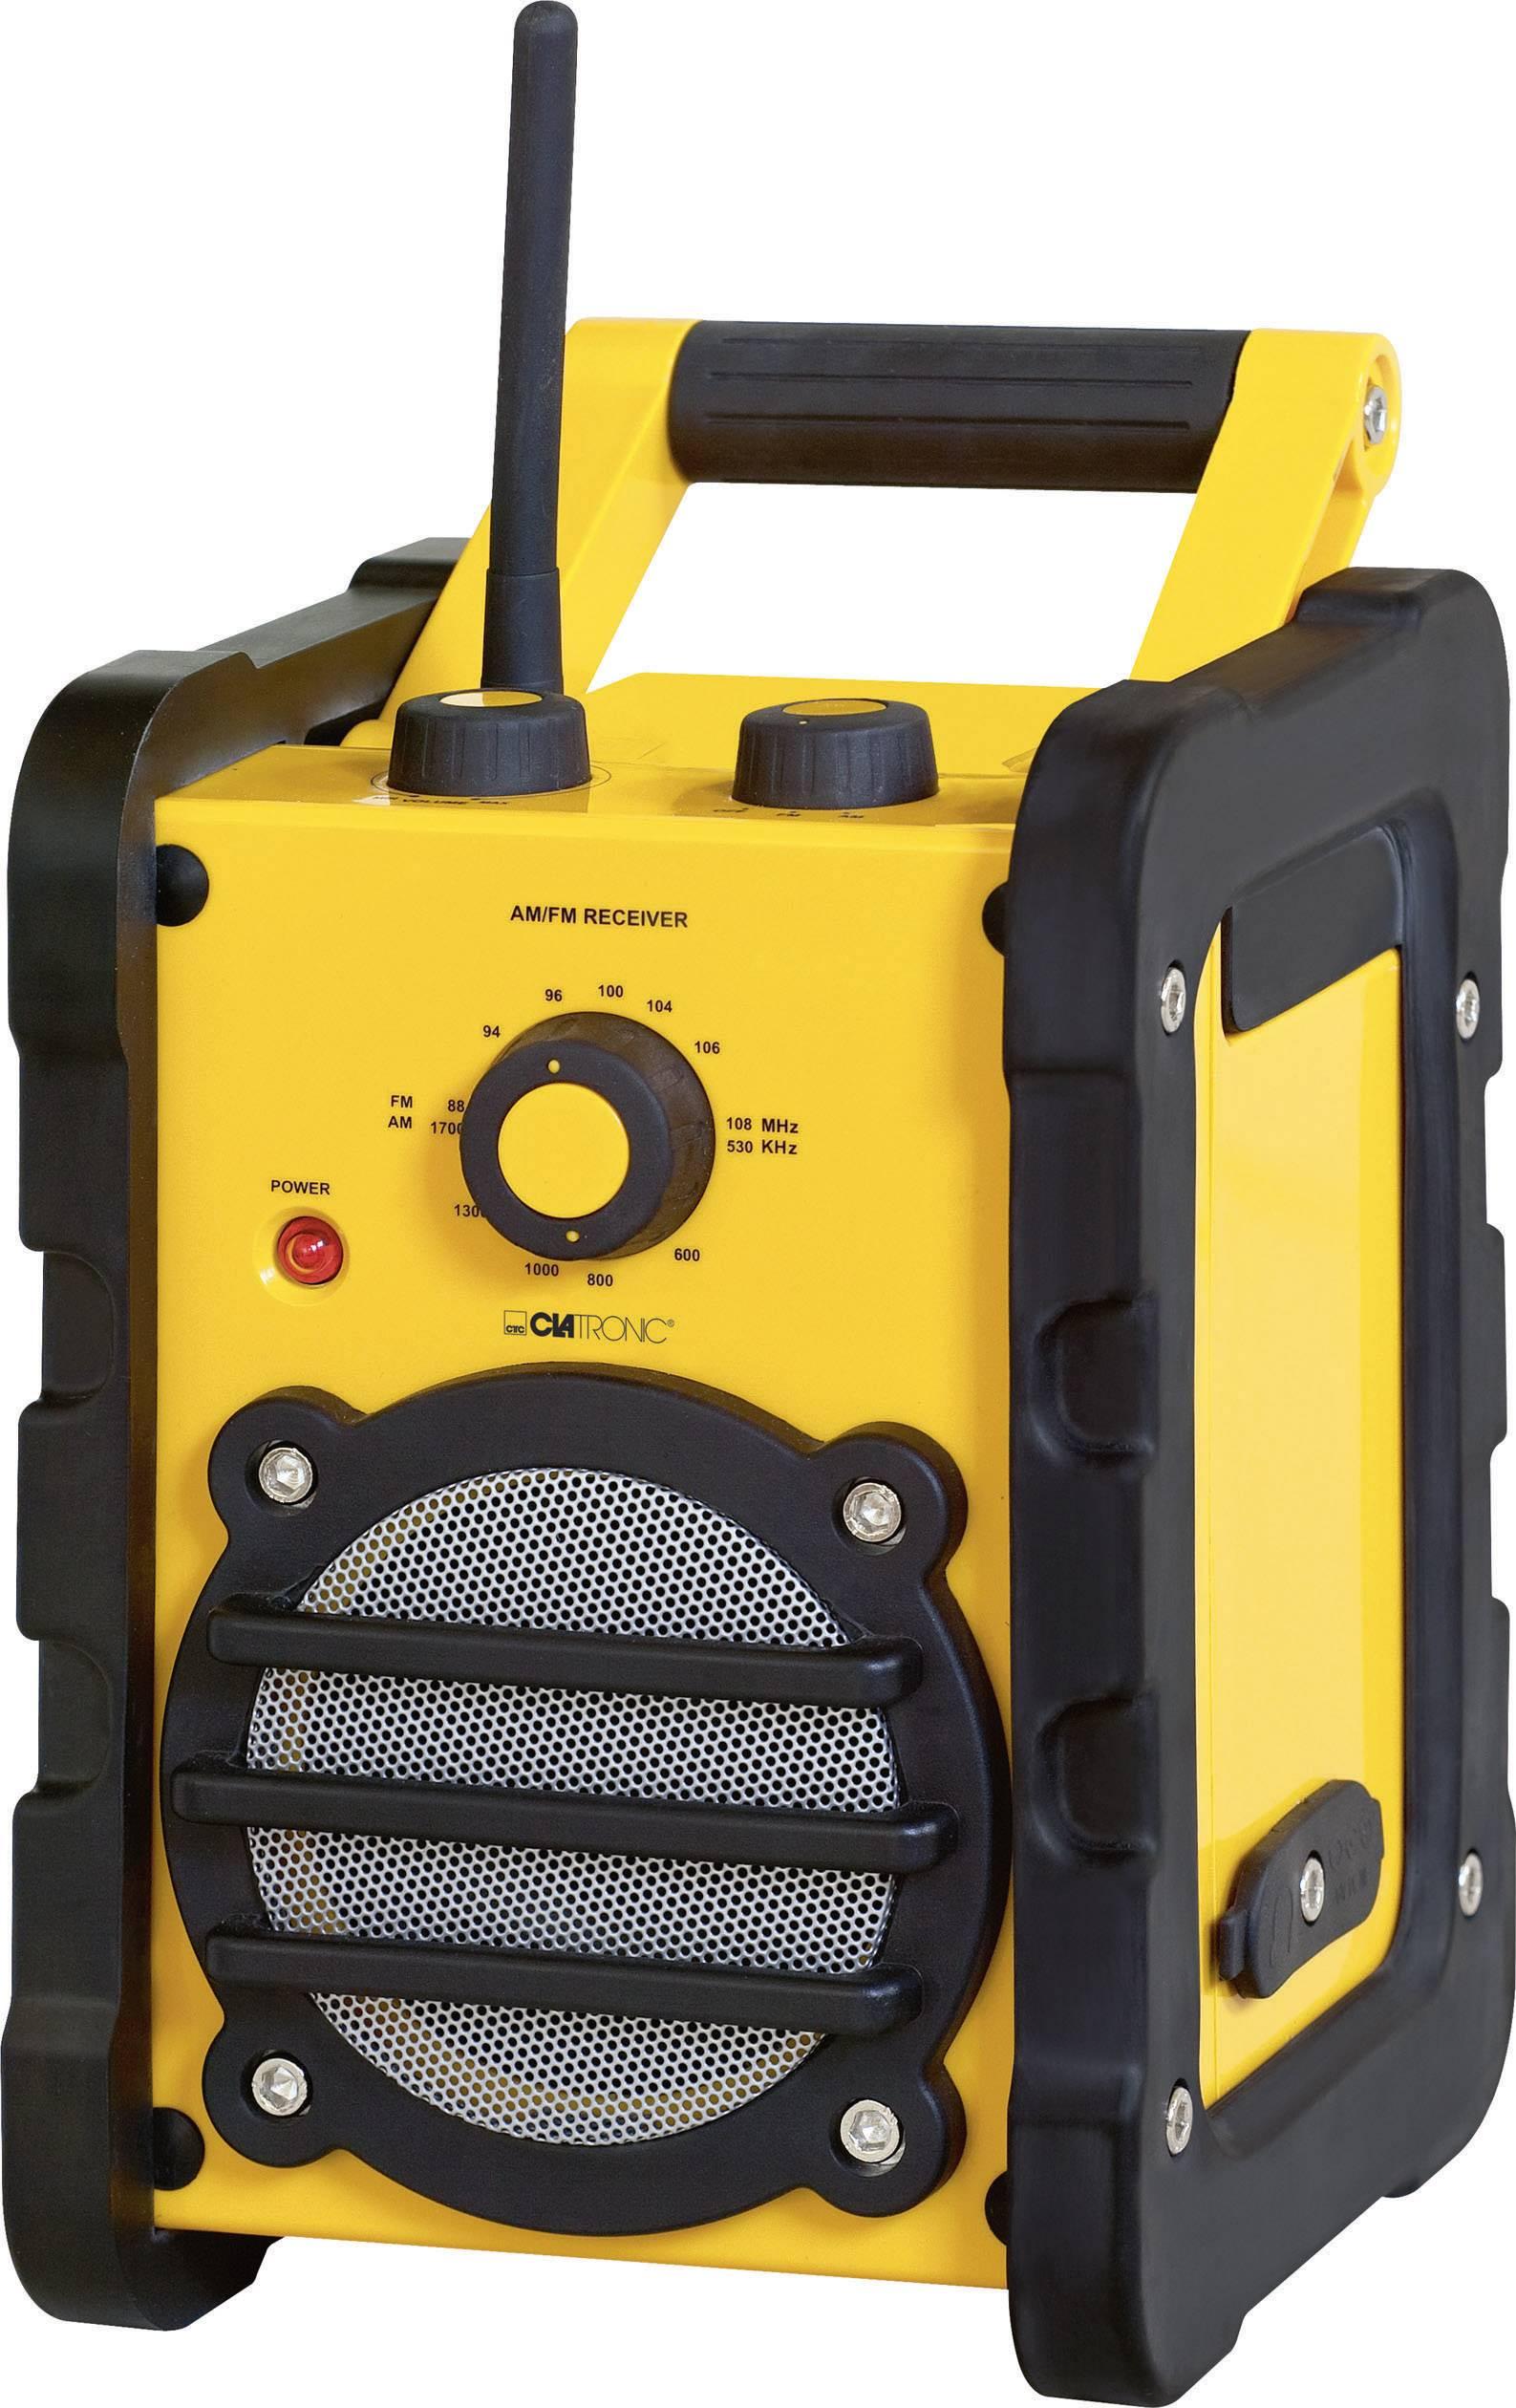 Clatronic BR 816 FM Radio da c